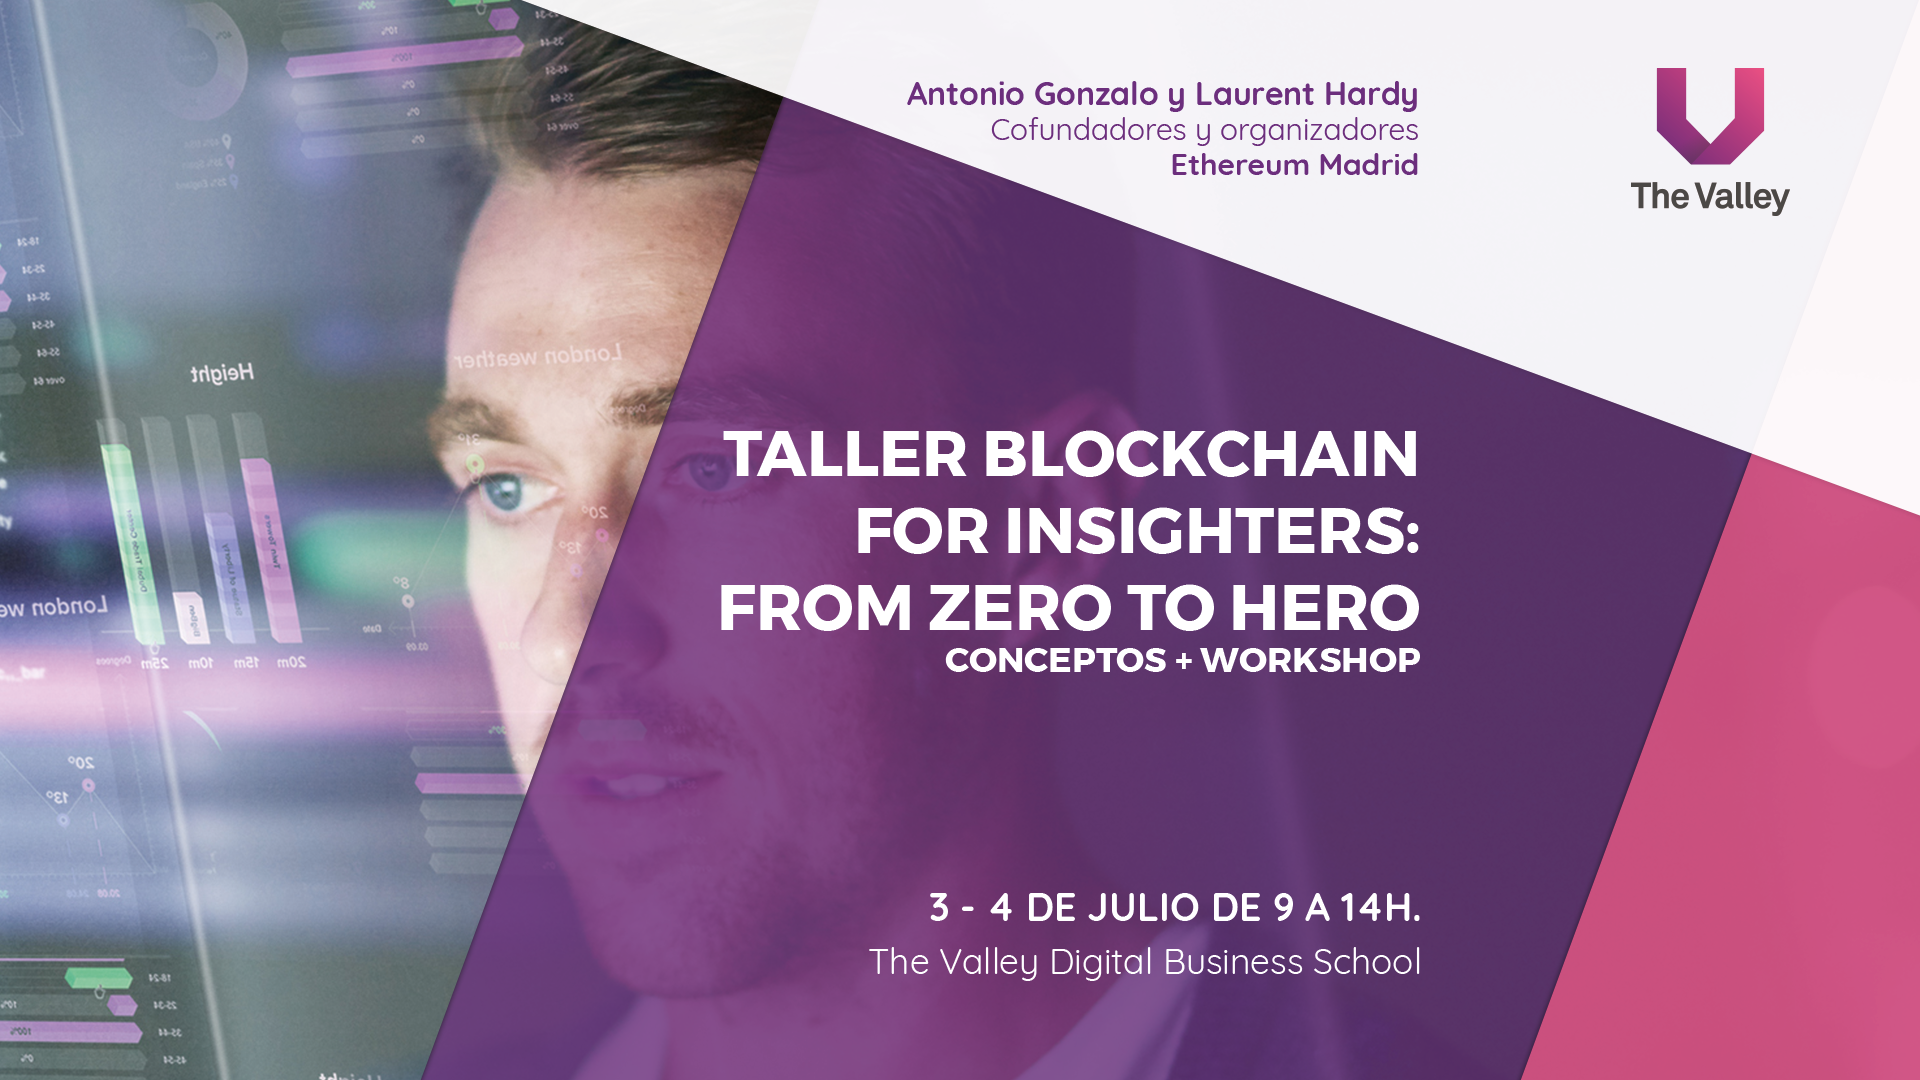 Evento Taller Blockchain